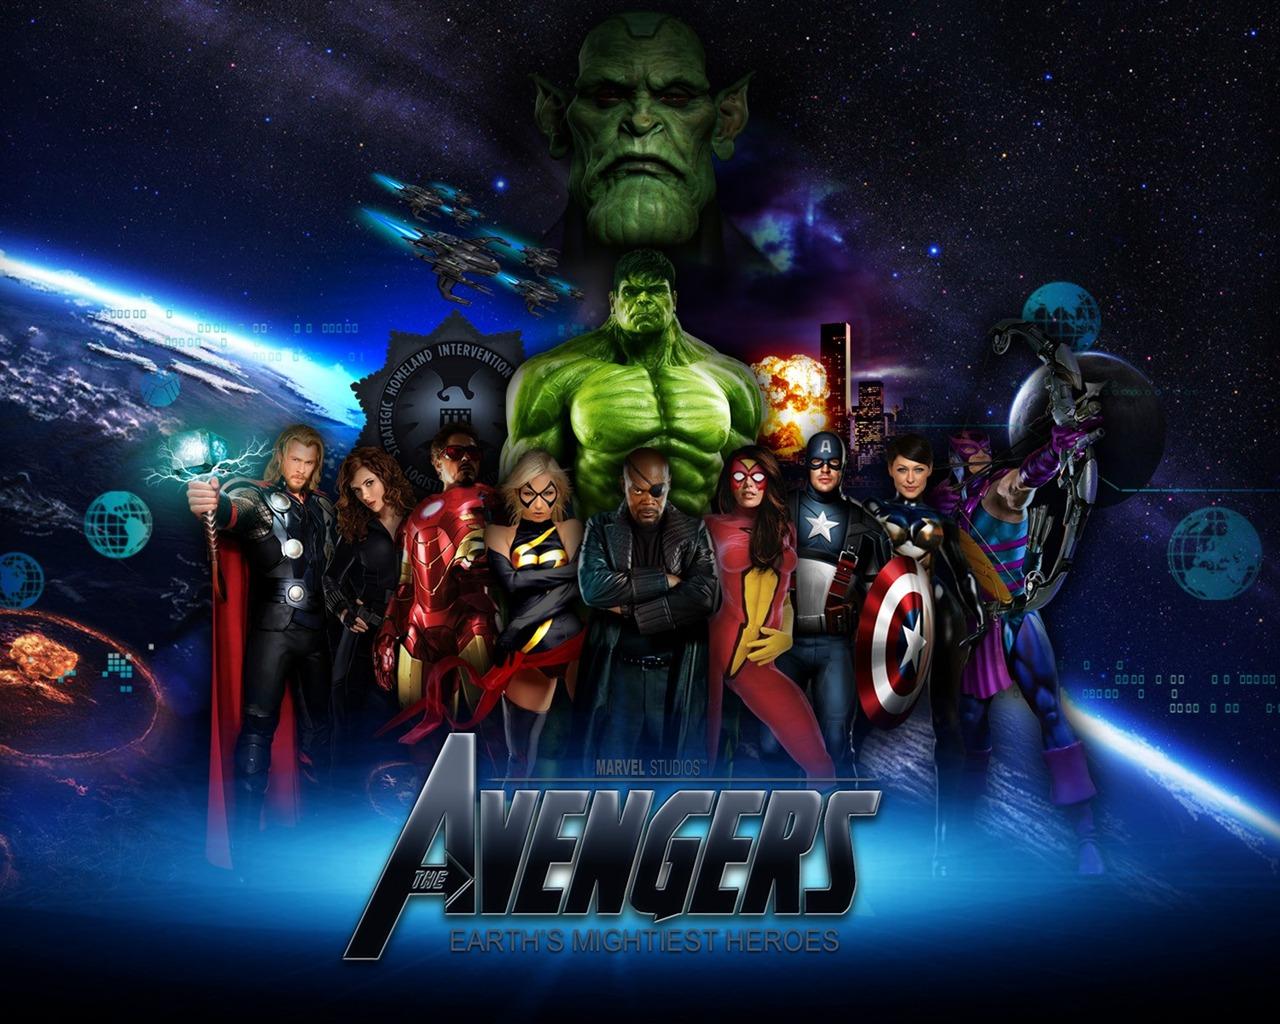 The Avengers 2012 HD Movie Desktop Wallpaper 09-1280x1024 Download | 10wallpaper.com